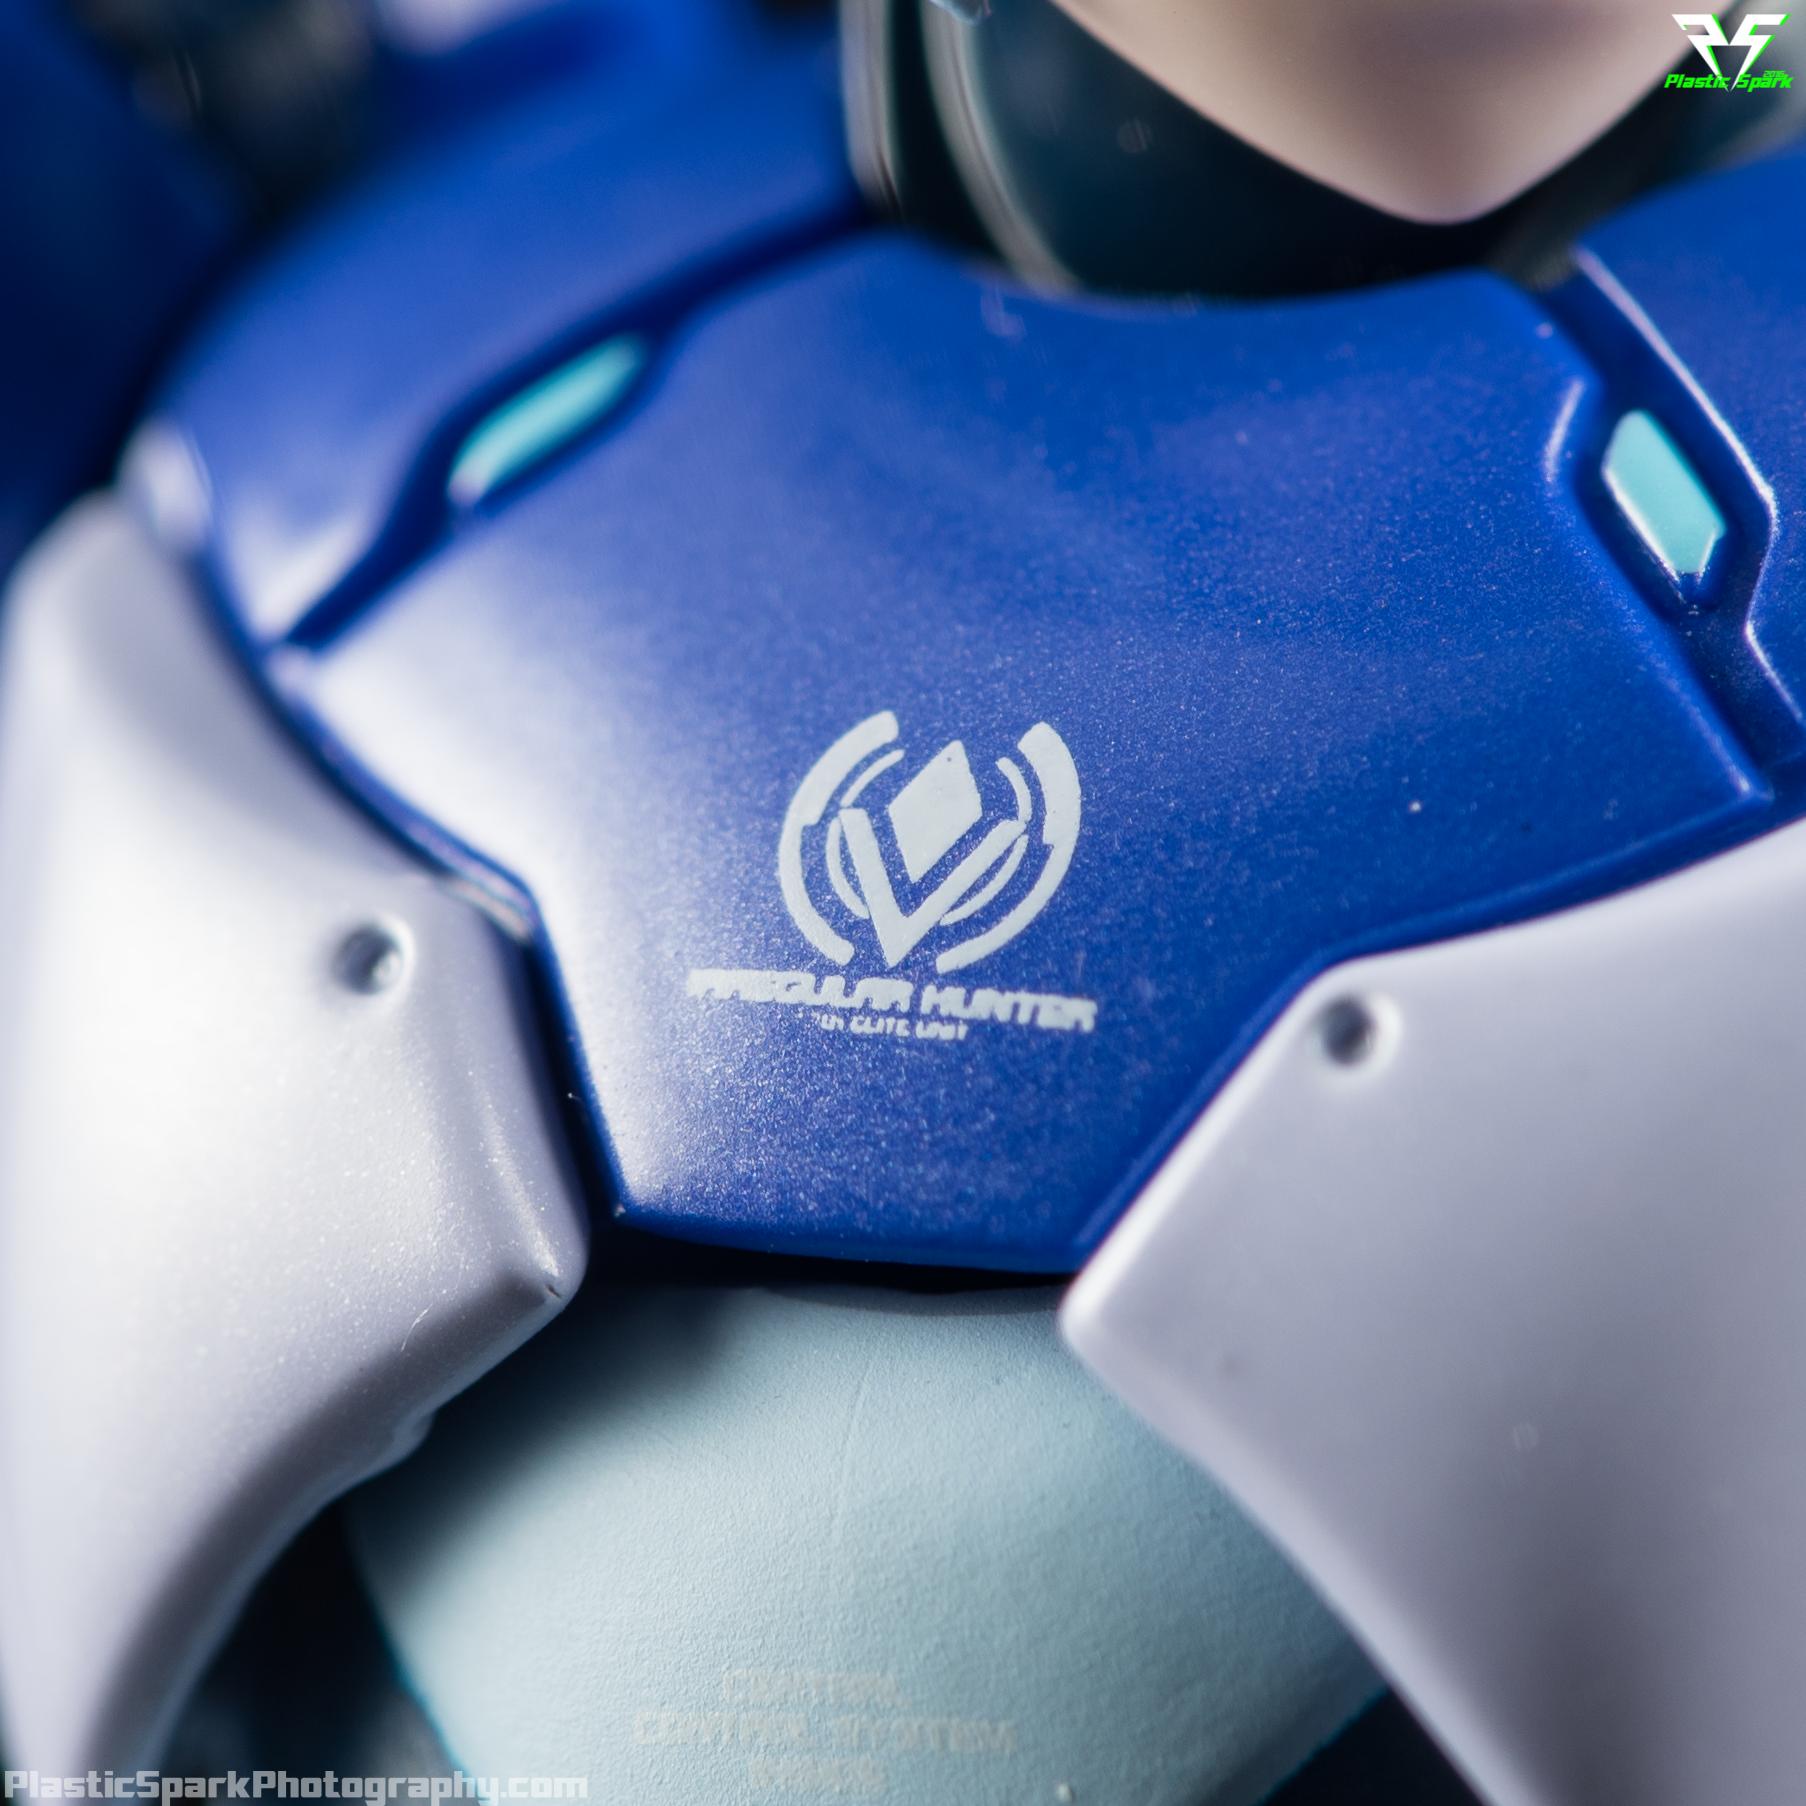 Truforce-Megaman-X-(Details)-(1-of-13).png